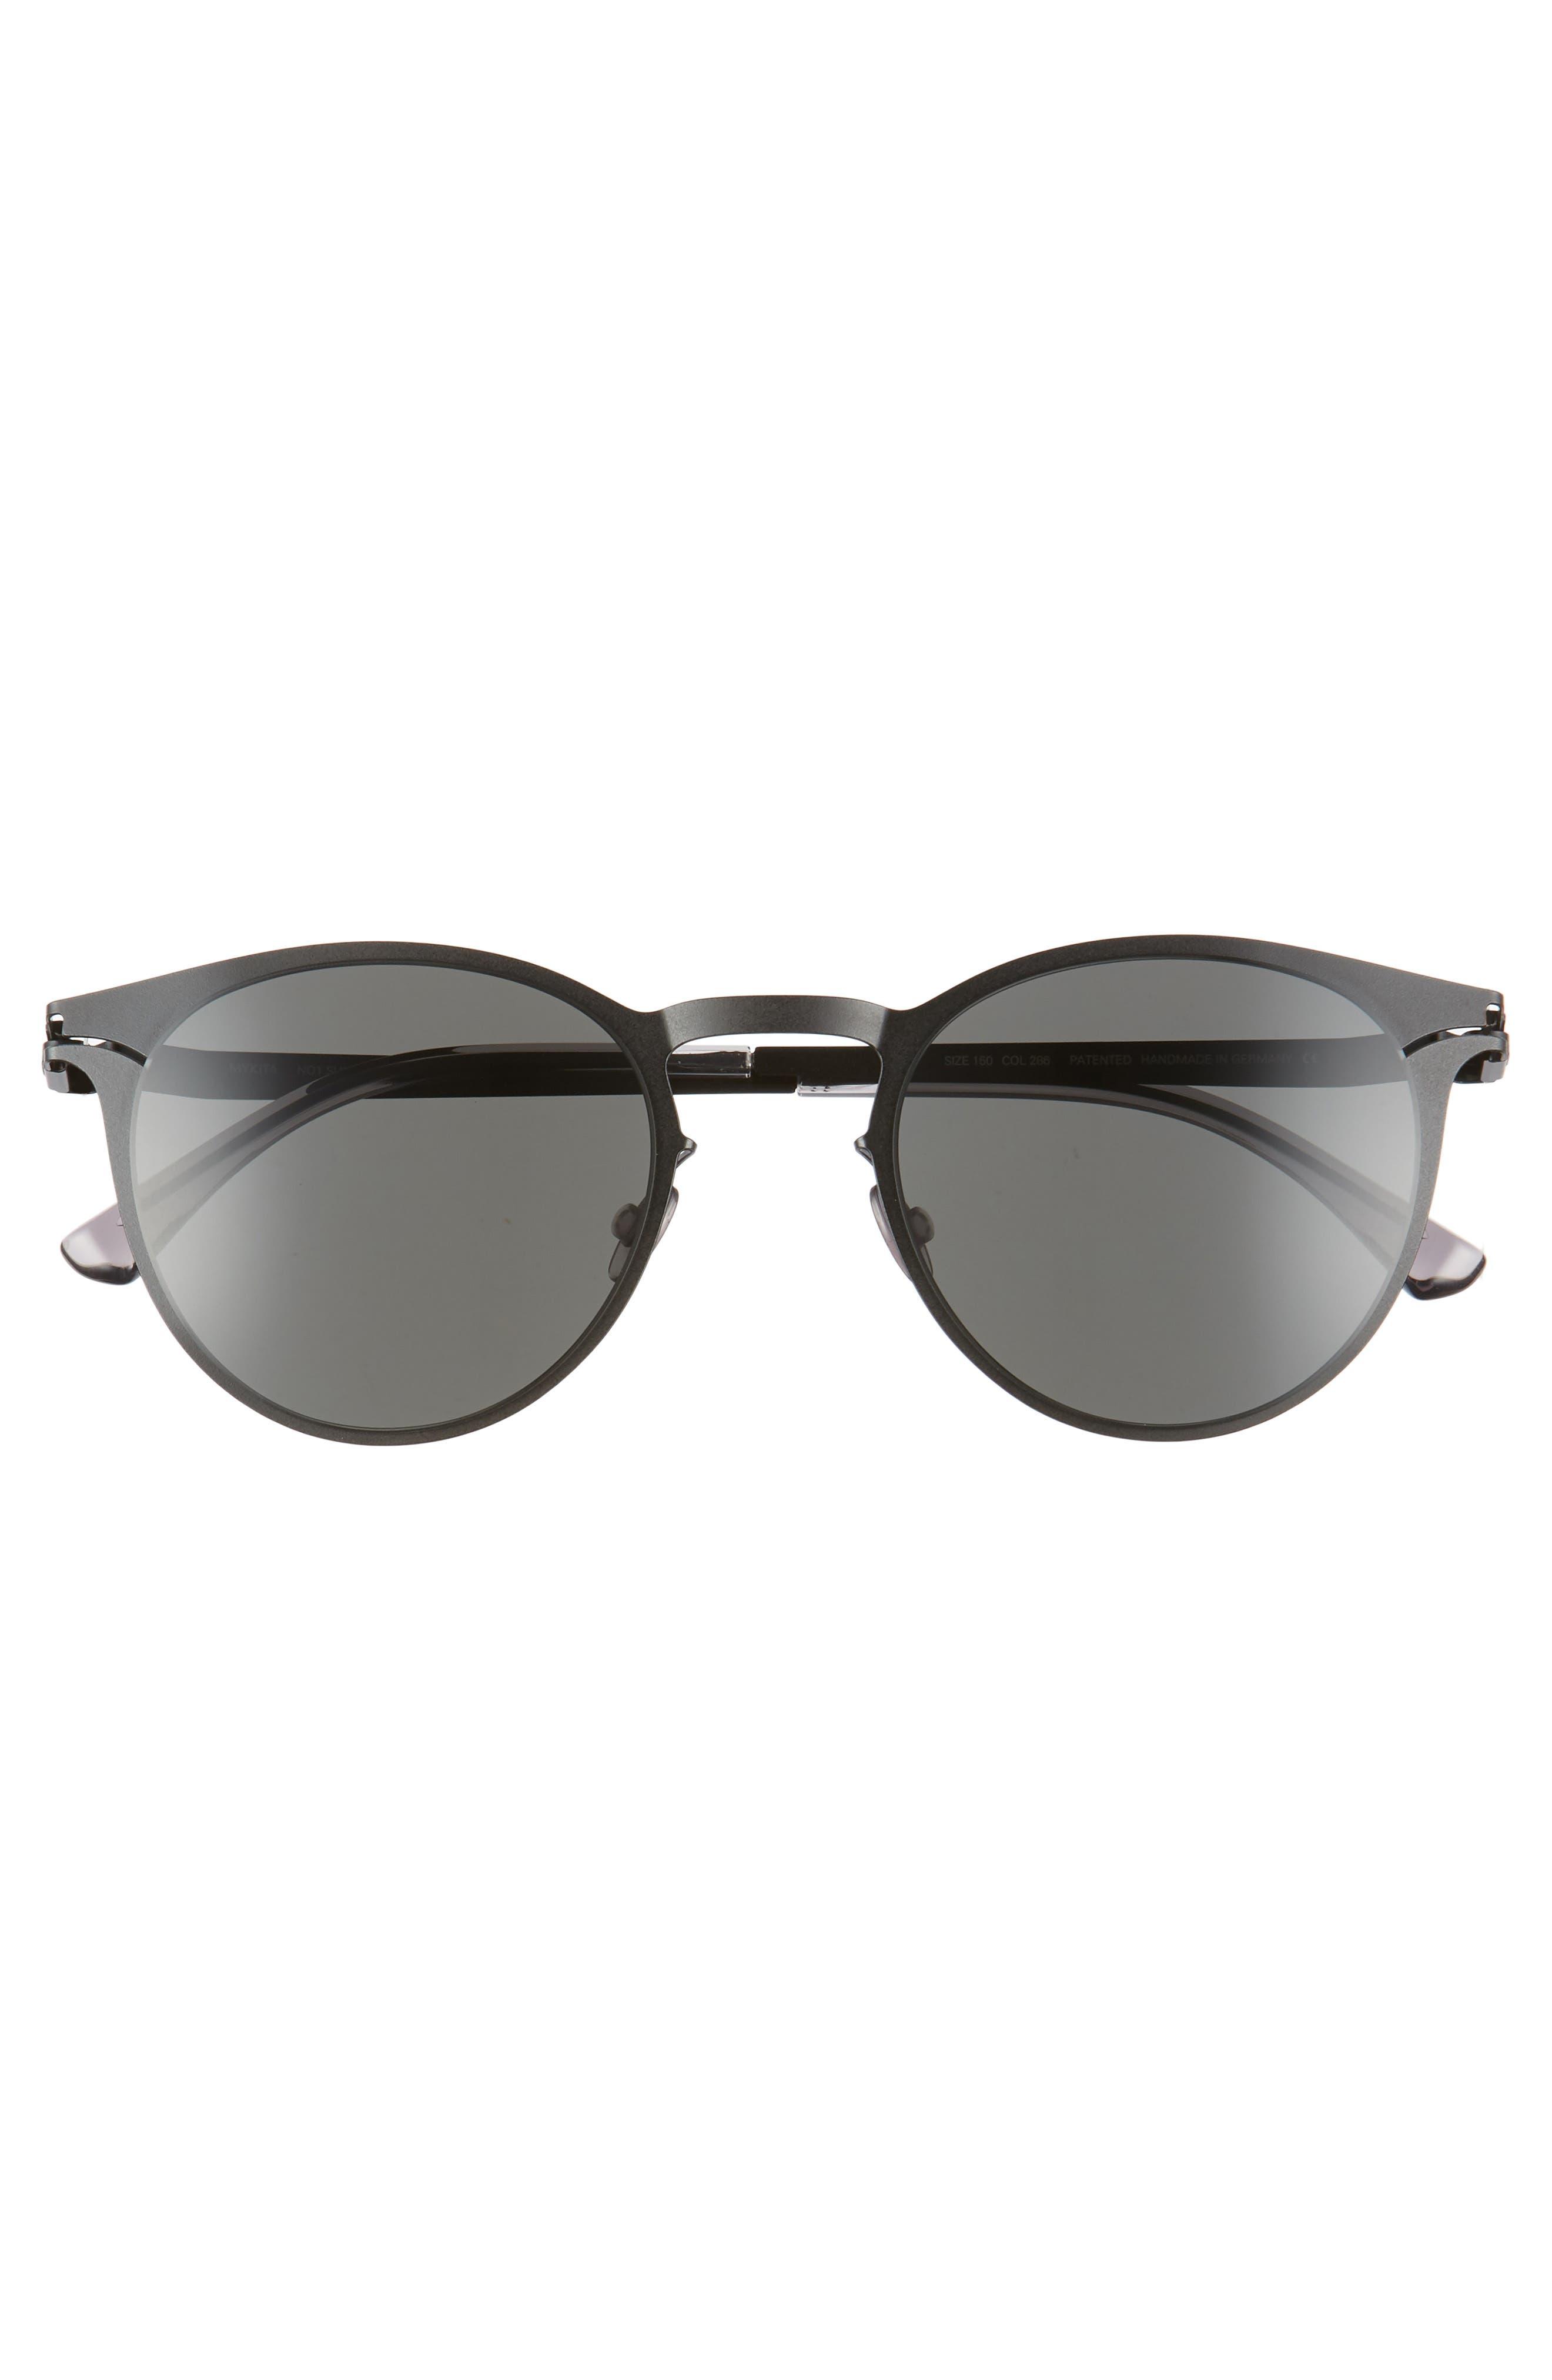 Federico 55mm Sunglasses,                             Alternate thumbnail 2, color,                             Matte Black